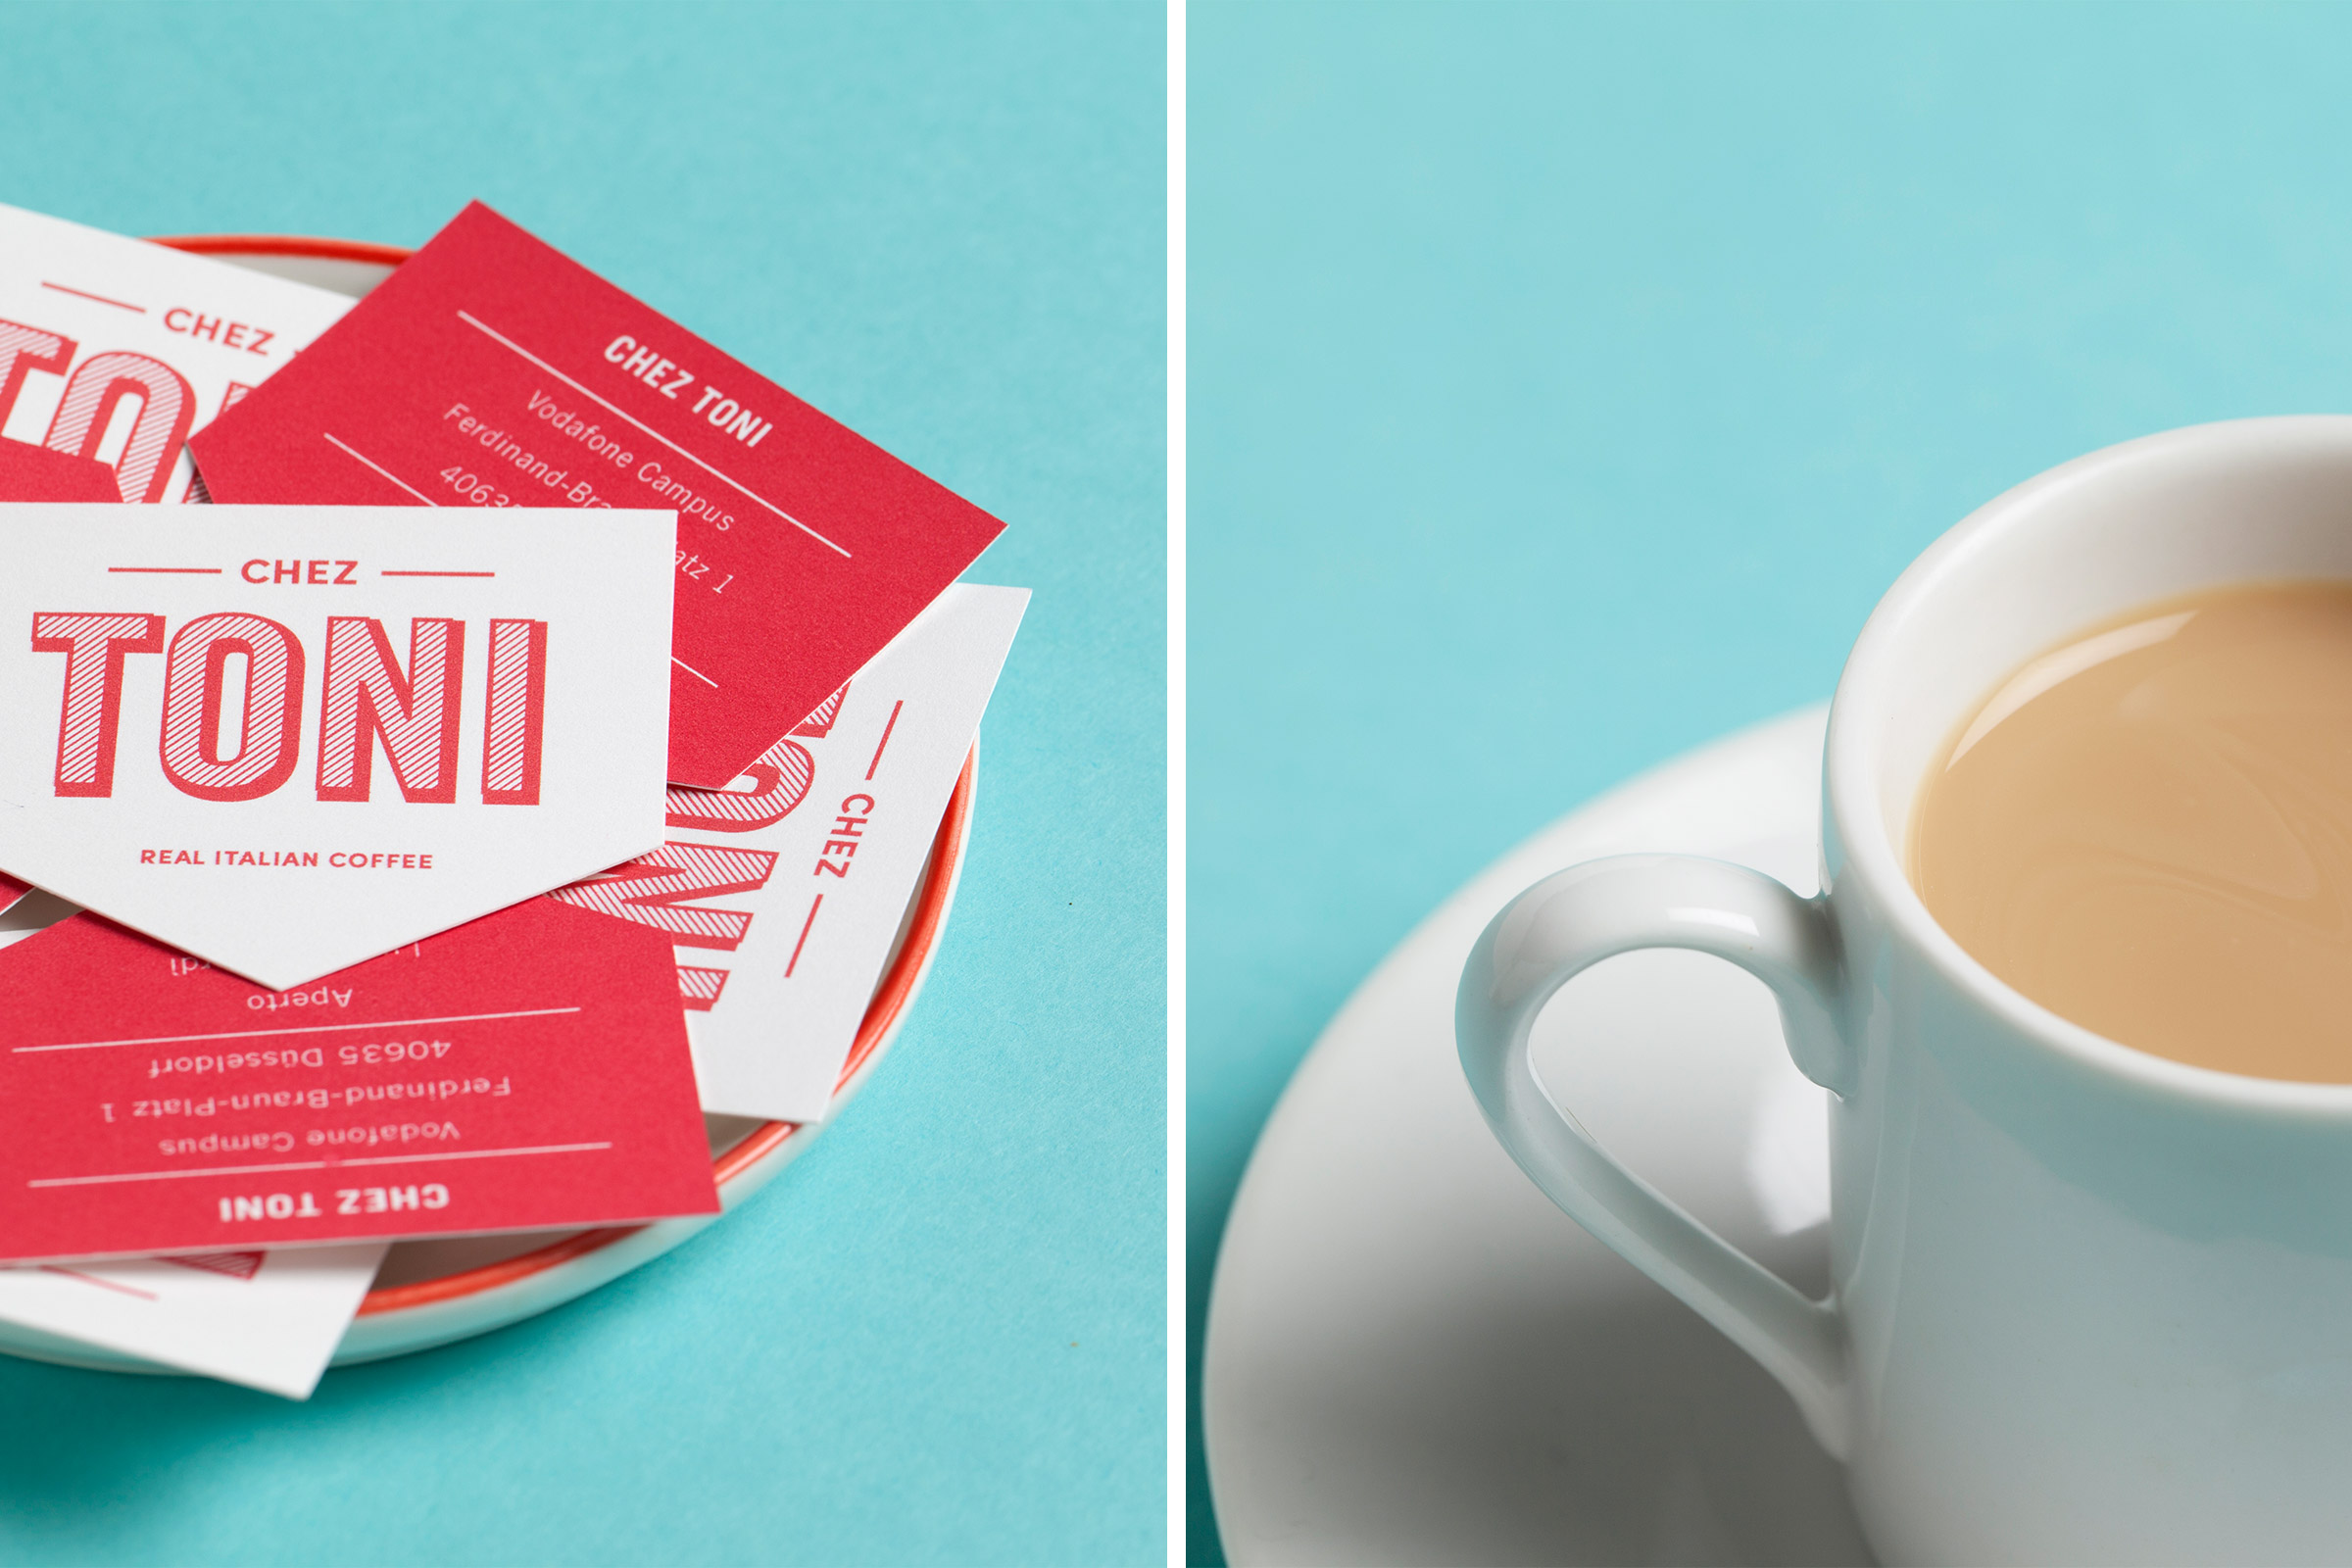 chez toni, speisekarte, vodafone, vodafone campus, düsseldorf, restaurant branding, kaffee